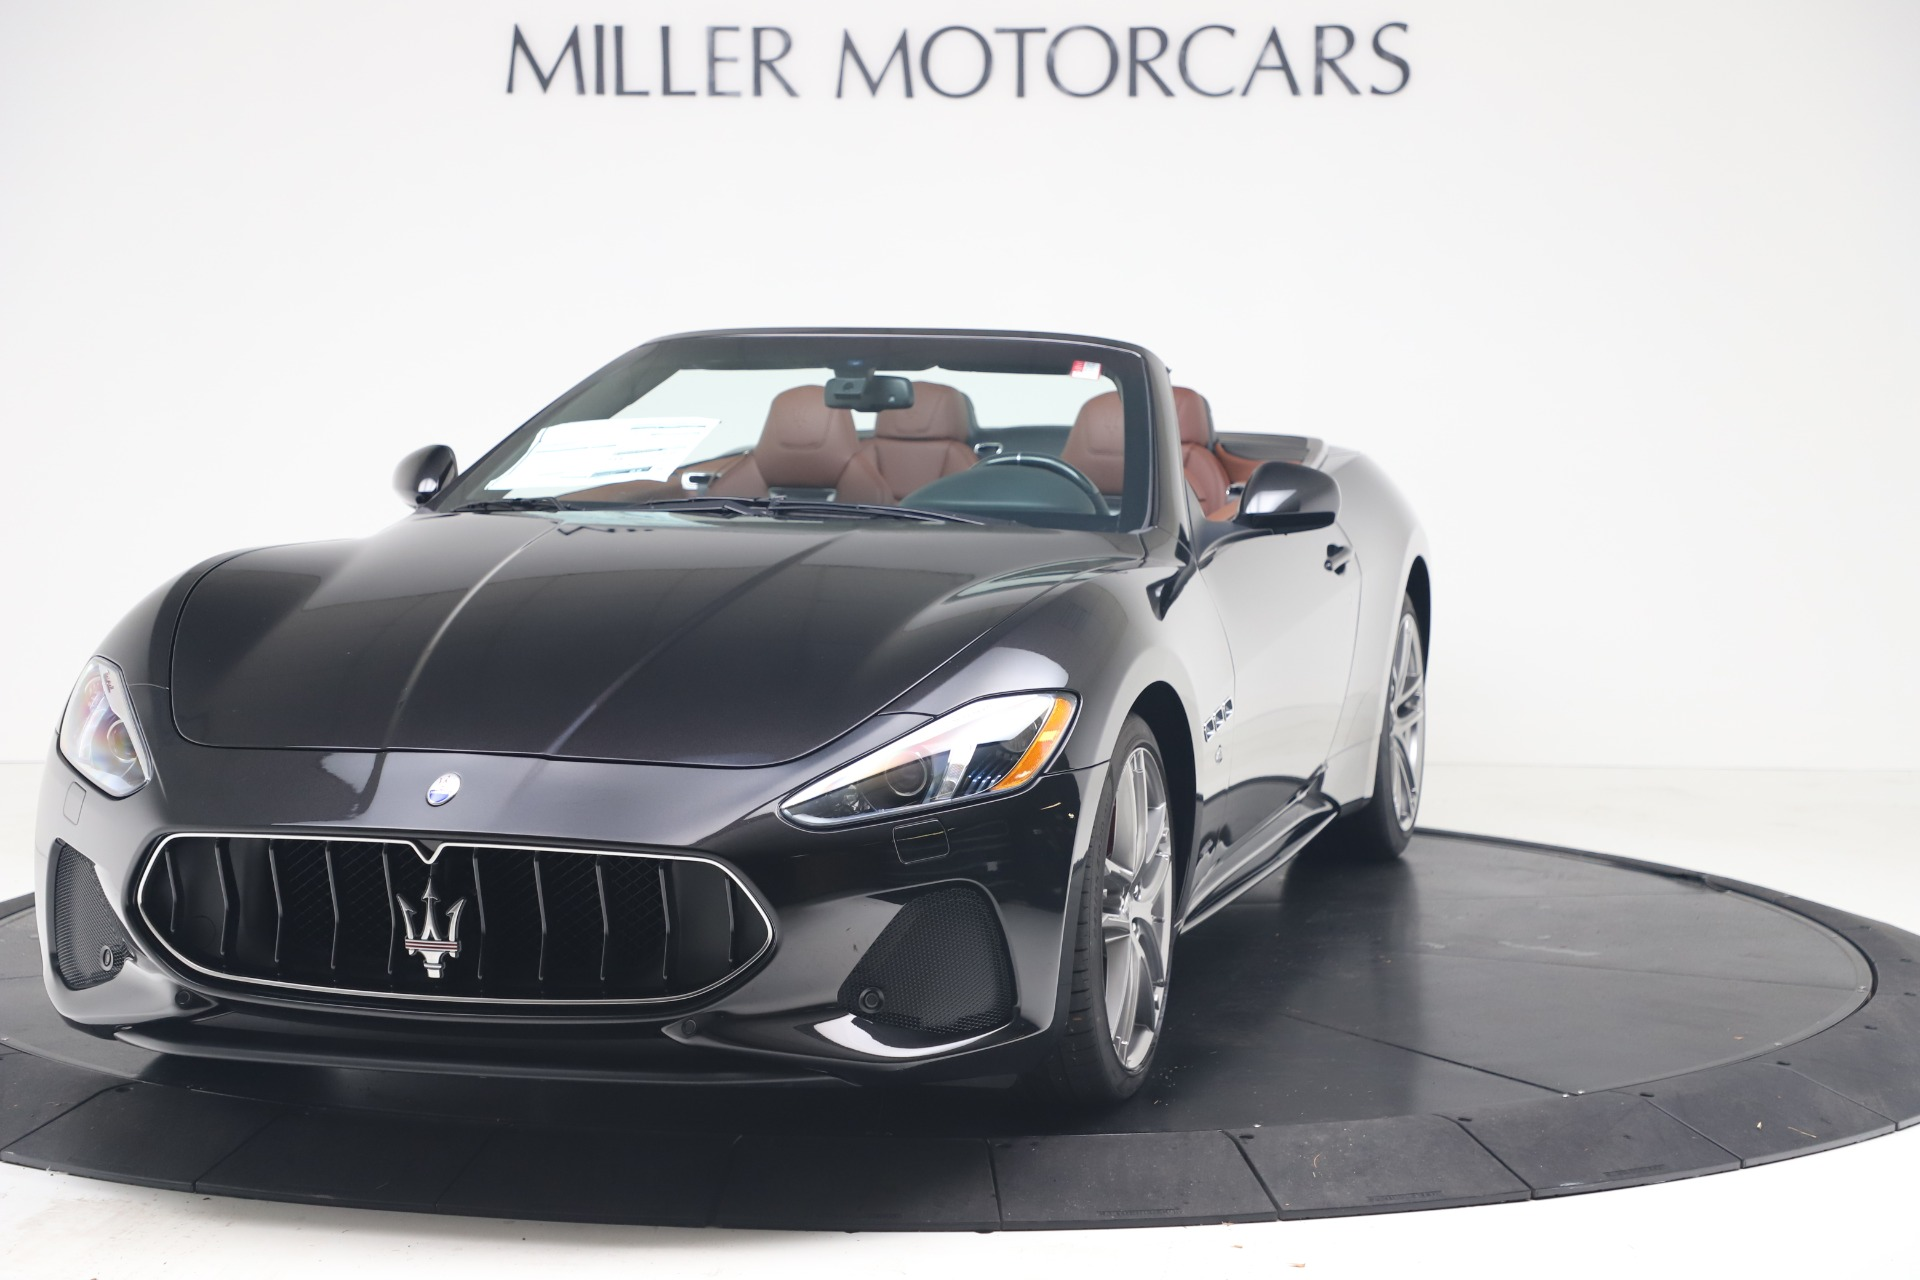 New 2019 Maserati GranTurismo Sport Convertible for sale $165,645 at Rolls-Royce Motor Cars Greenwich in Greenwich CT 06830 1